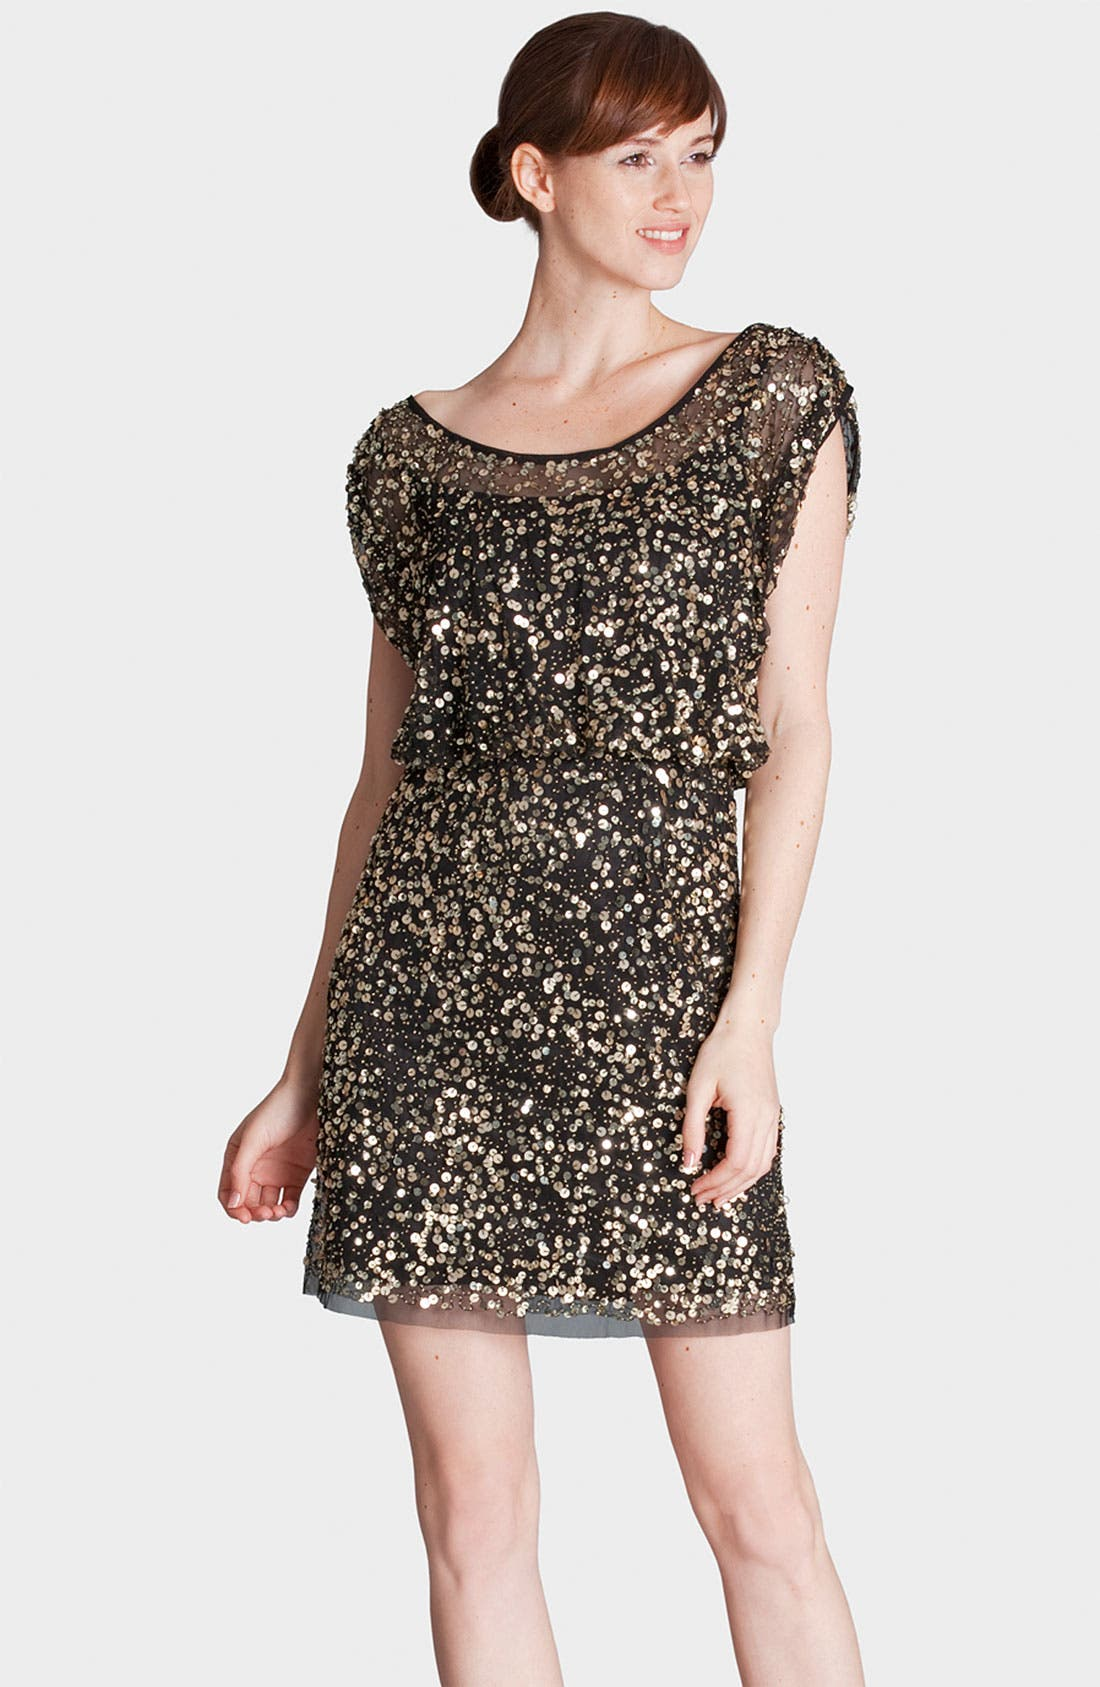 Alternate Image 1 Selected - JS Collections Scoop Neck Sequin Mesh Blouson Dress